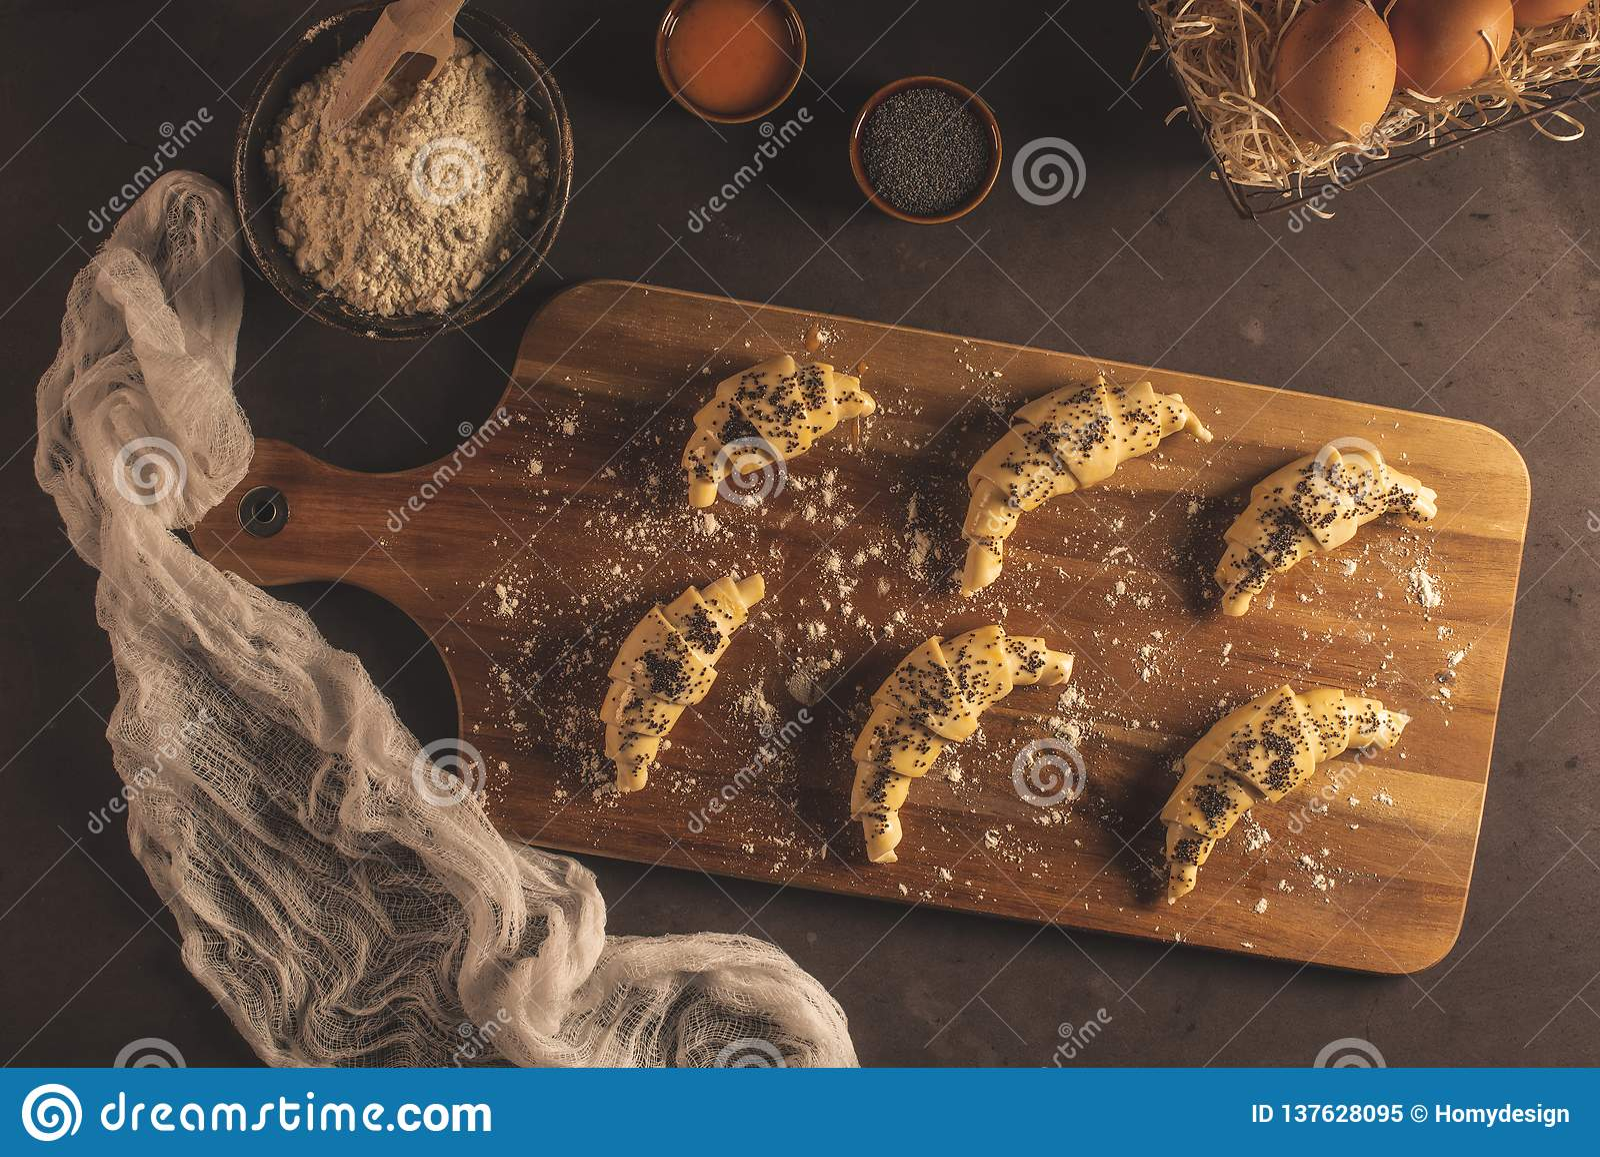 Сырцовый круассан с ингредиентами